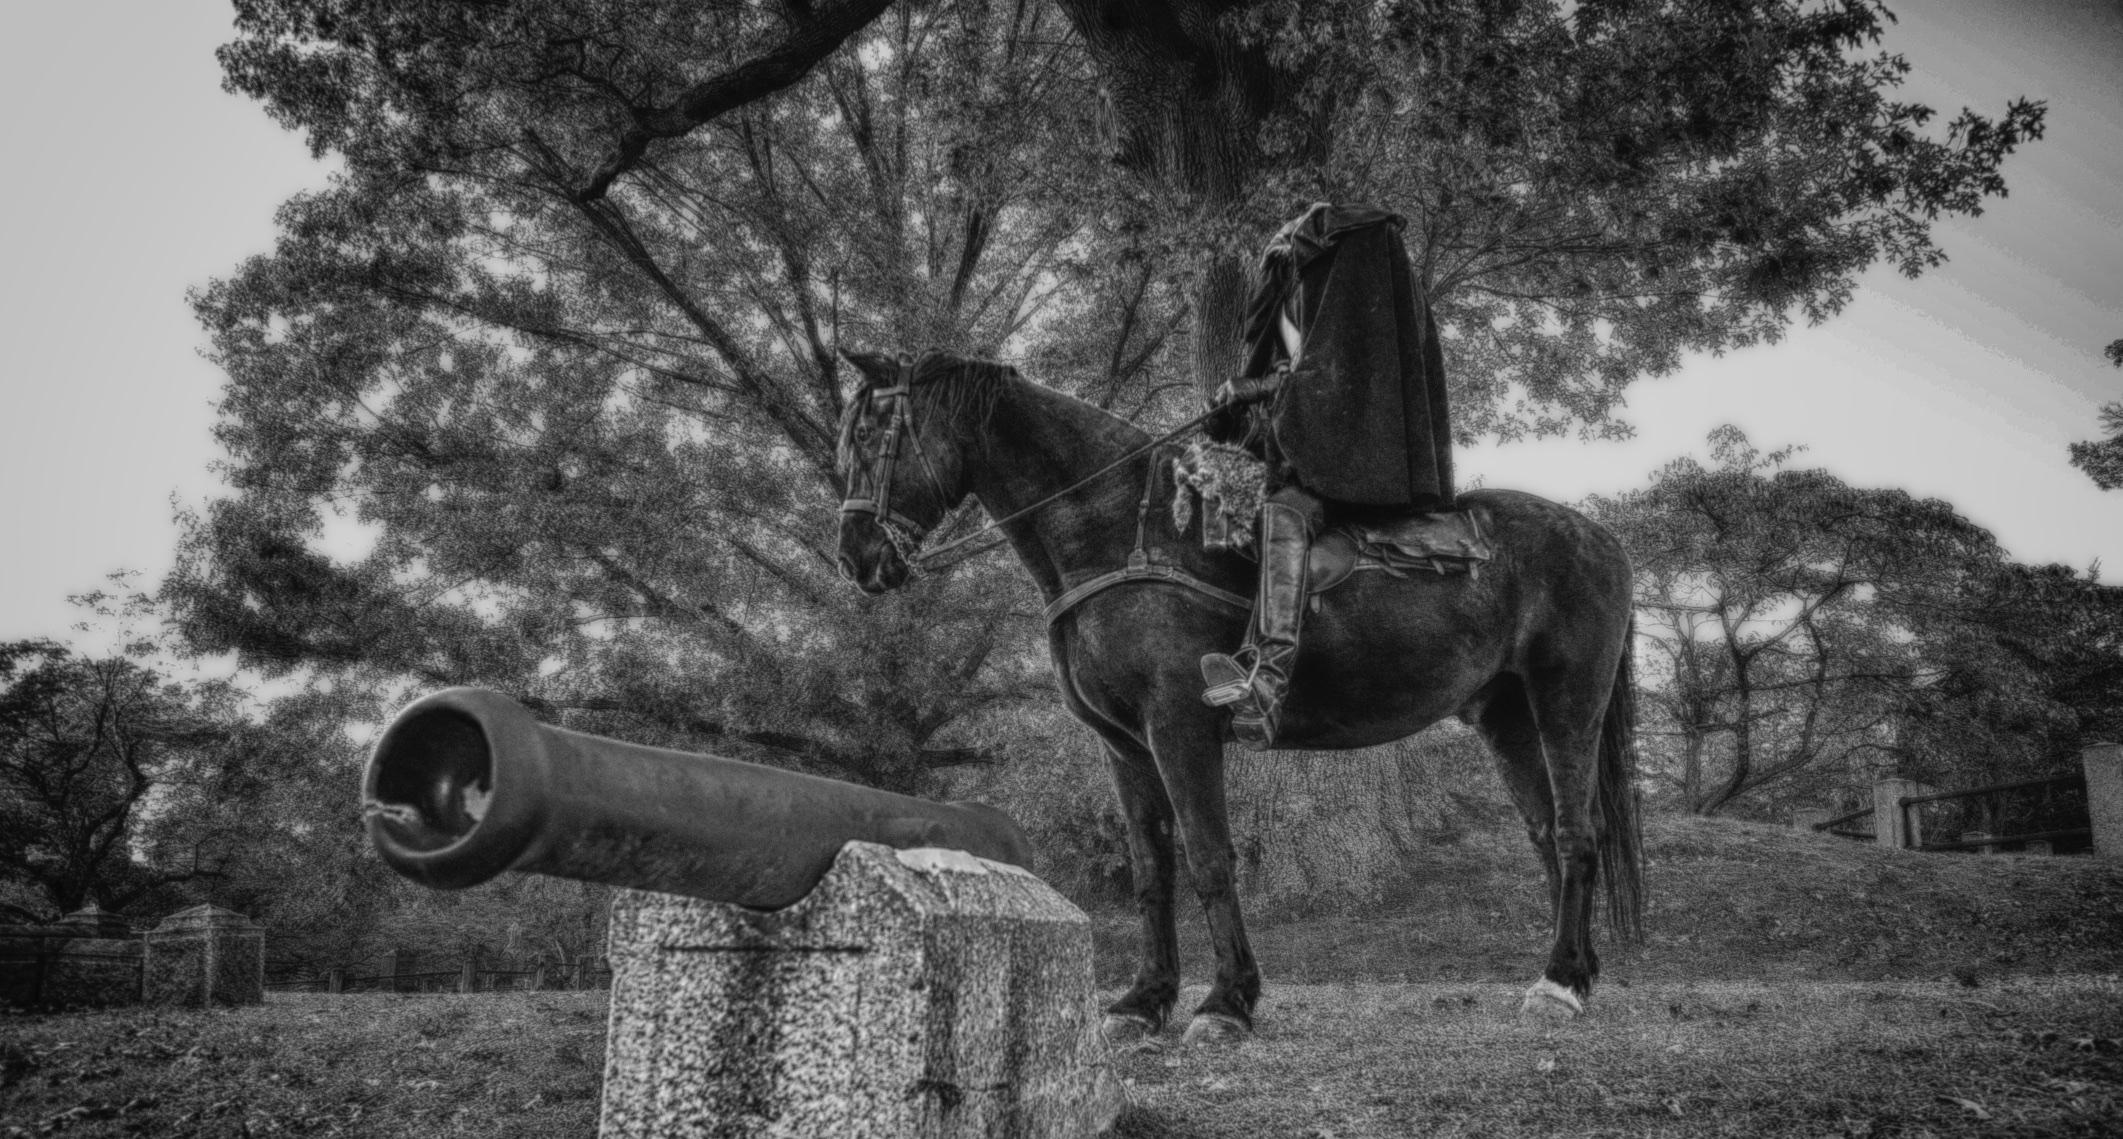 Headless horseman posed behind Sleepy Hollow Cemetery's Revolutionary War monument